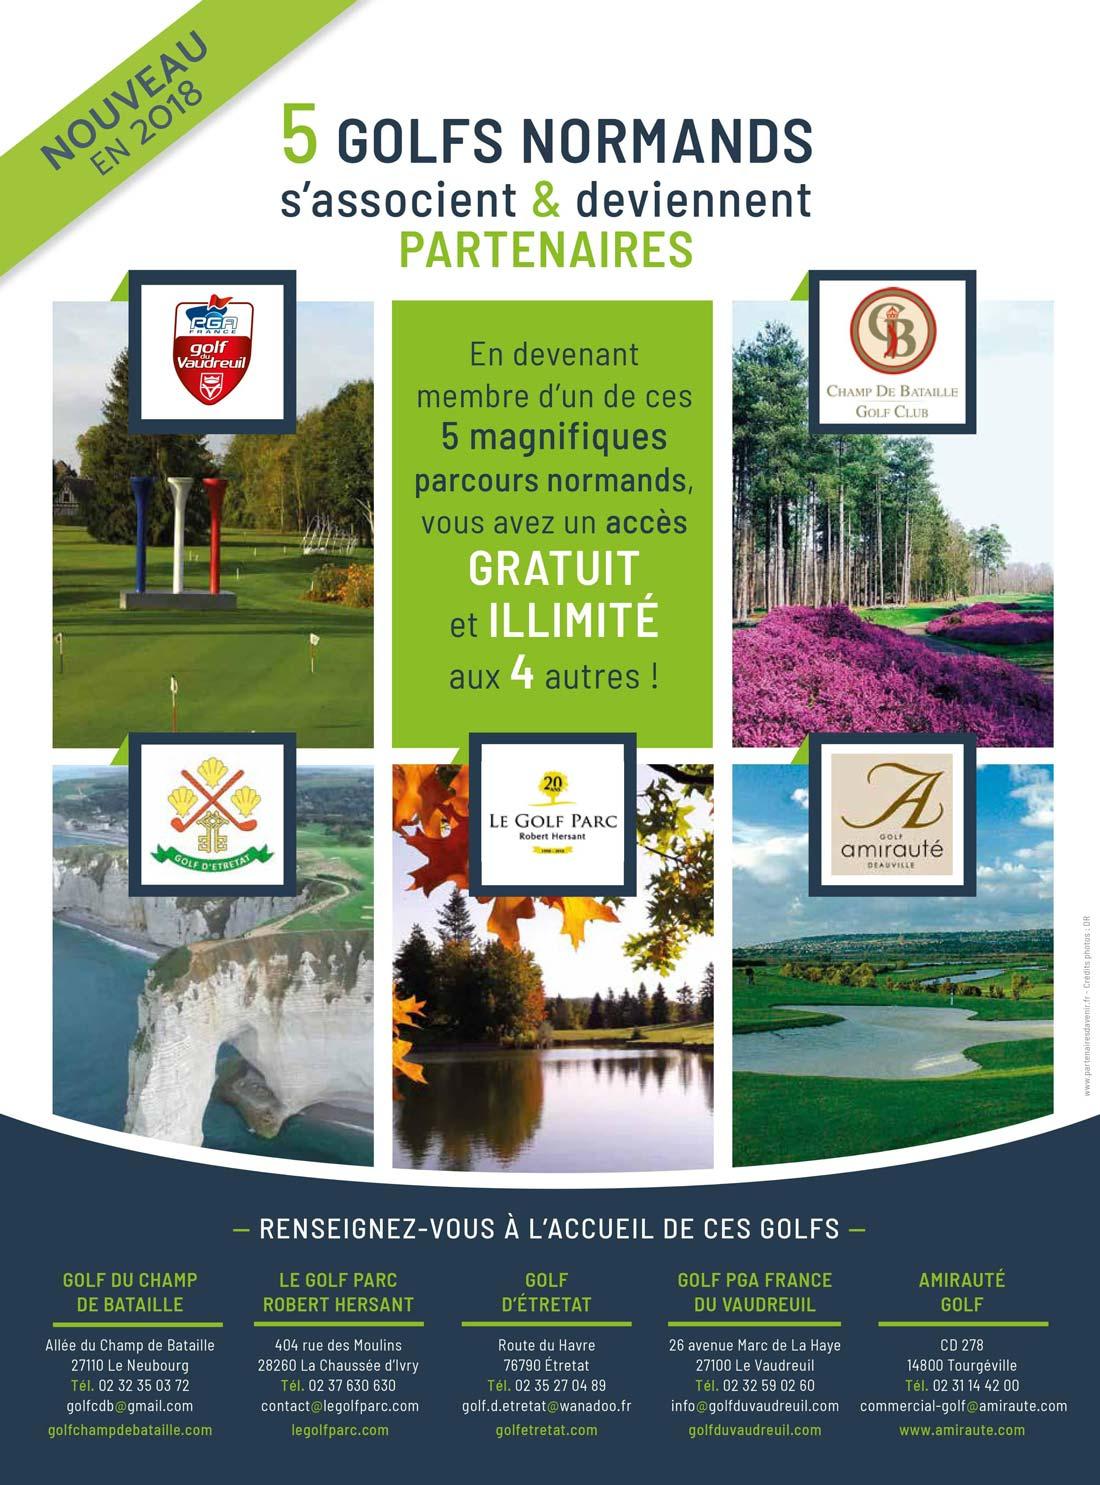 5 golfs normands partenaires